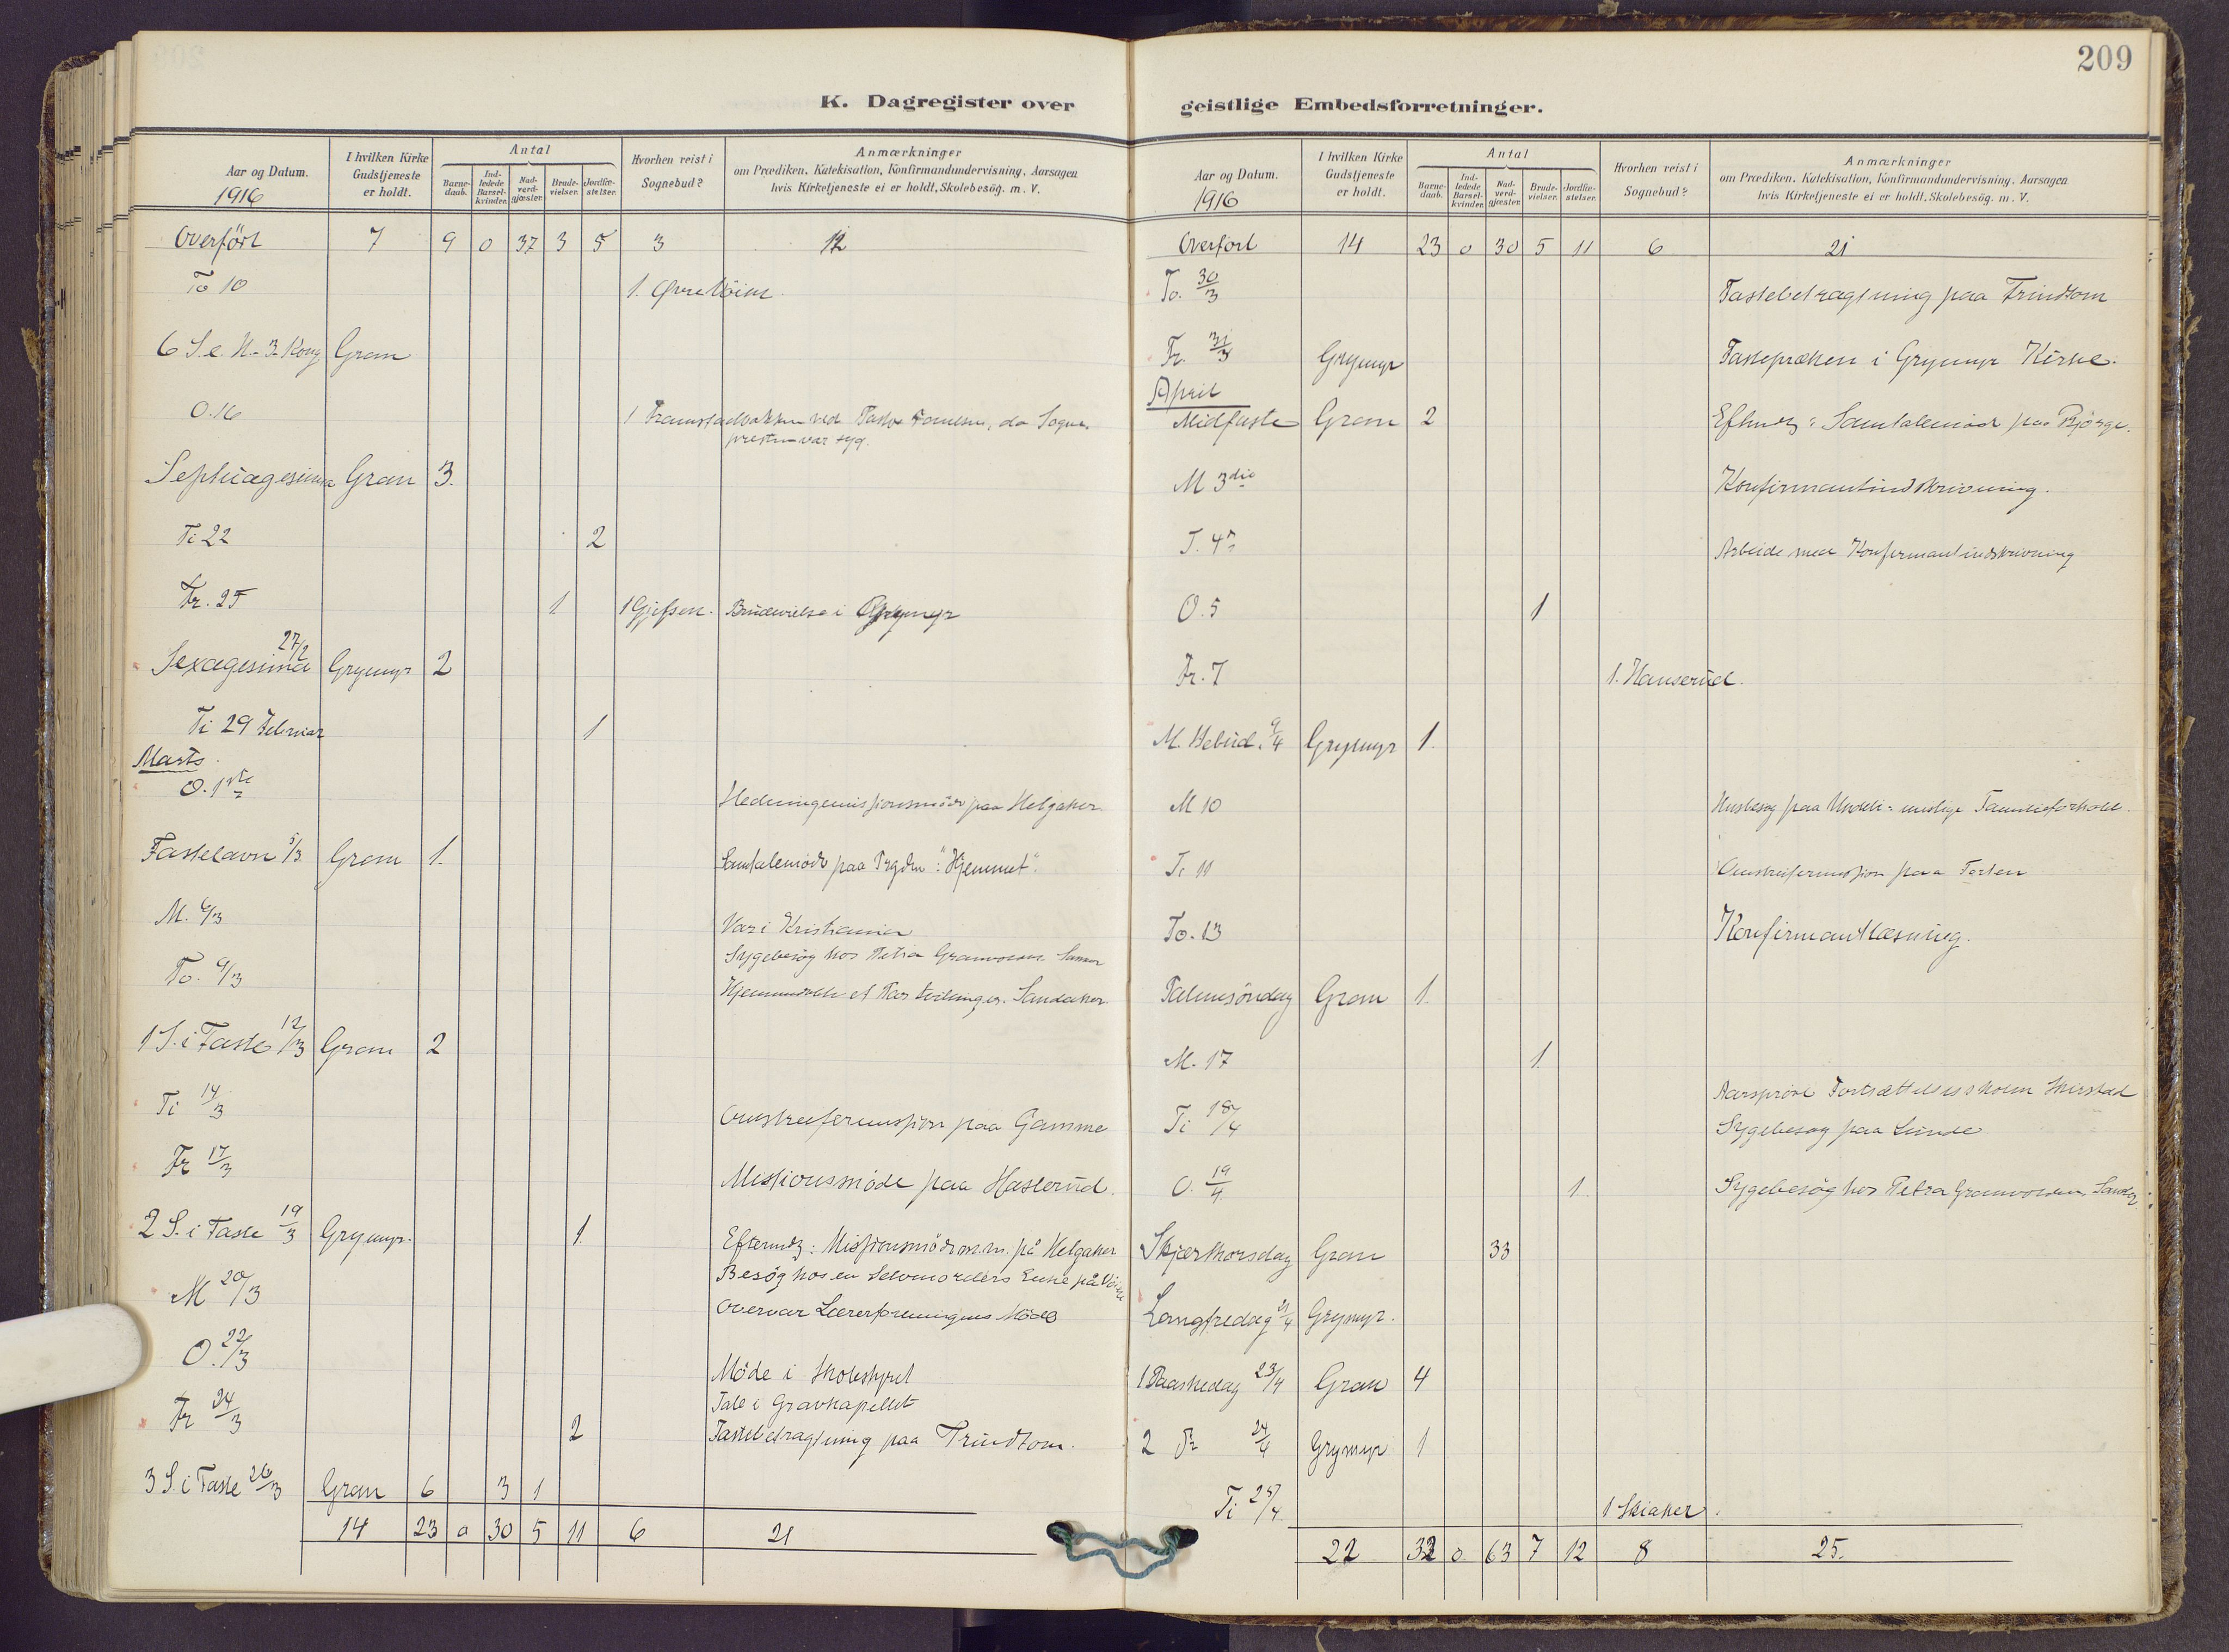 SAH, Gran prestekontor, Ministerialbok nr. 22, 1908-1918, s. 209